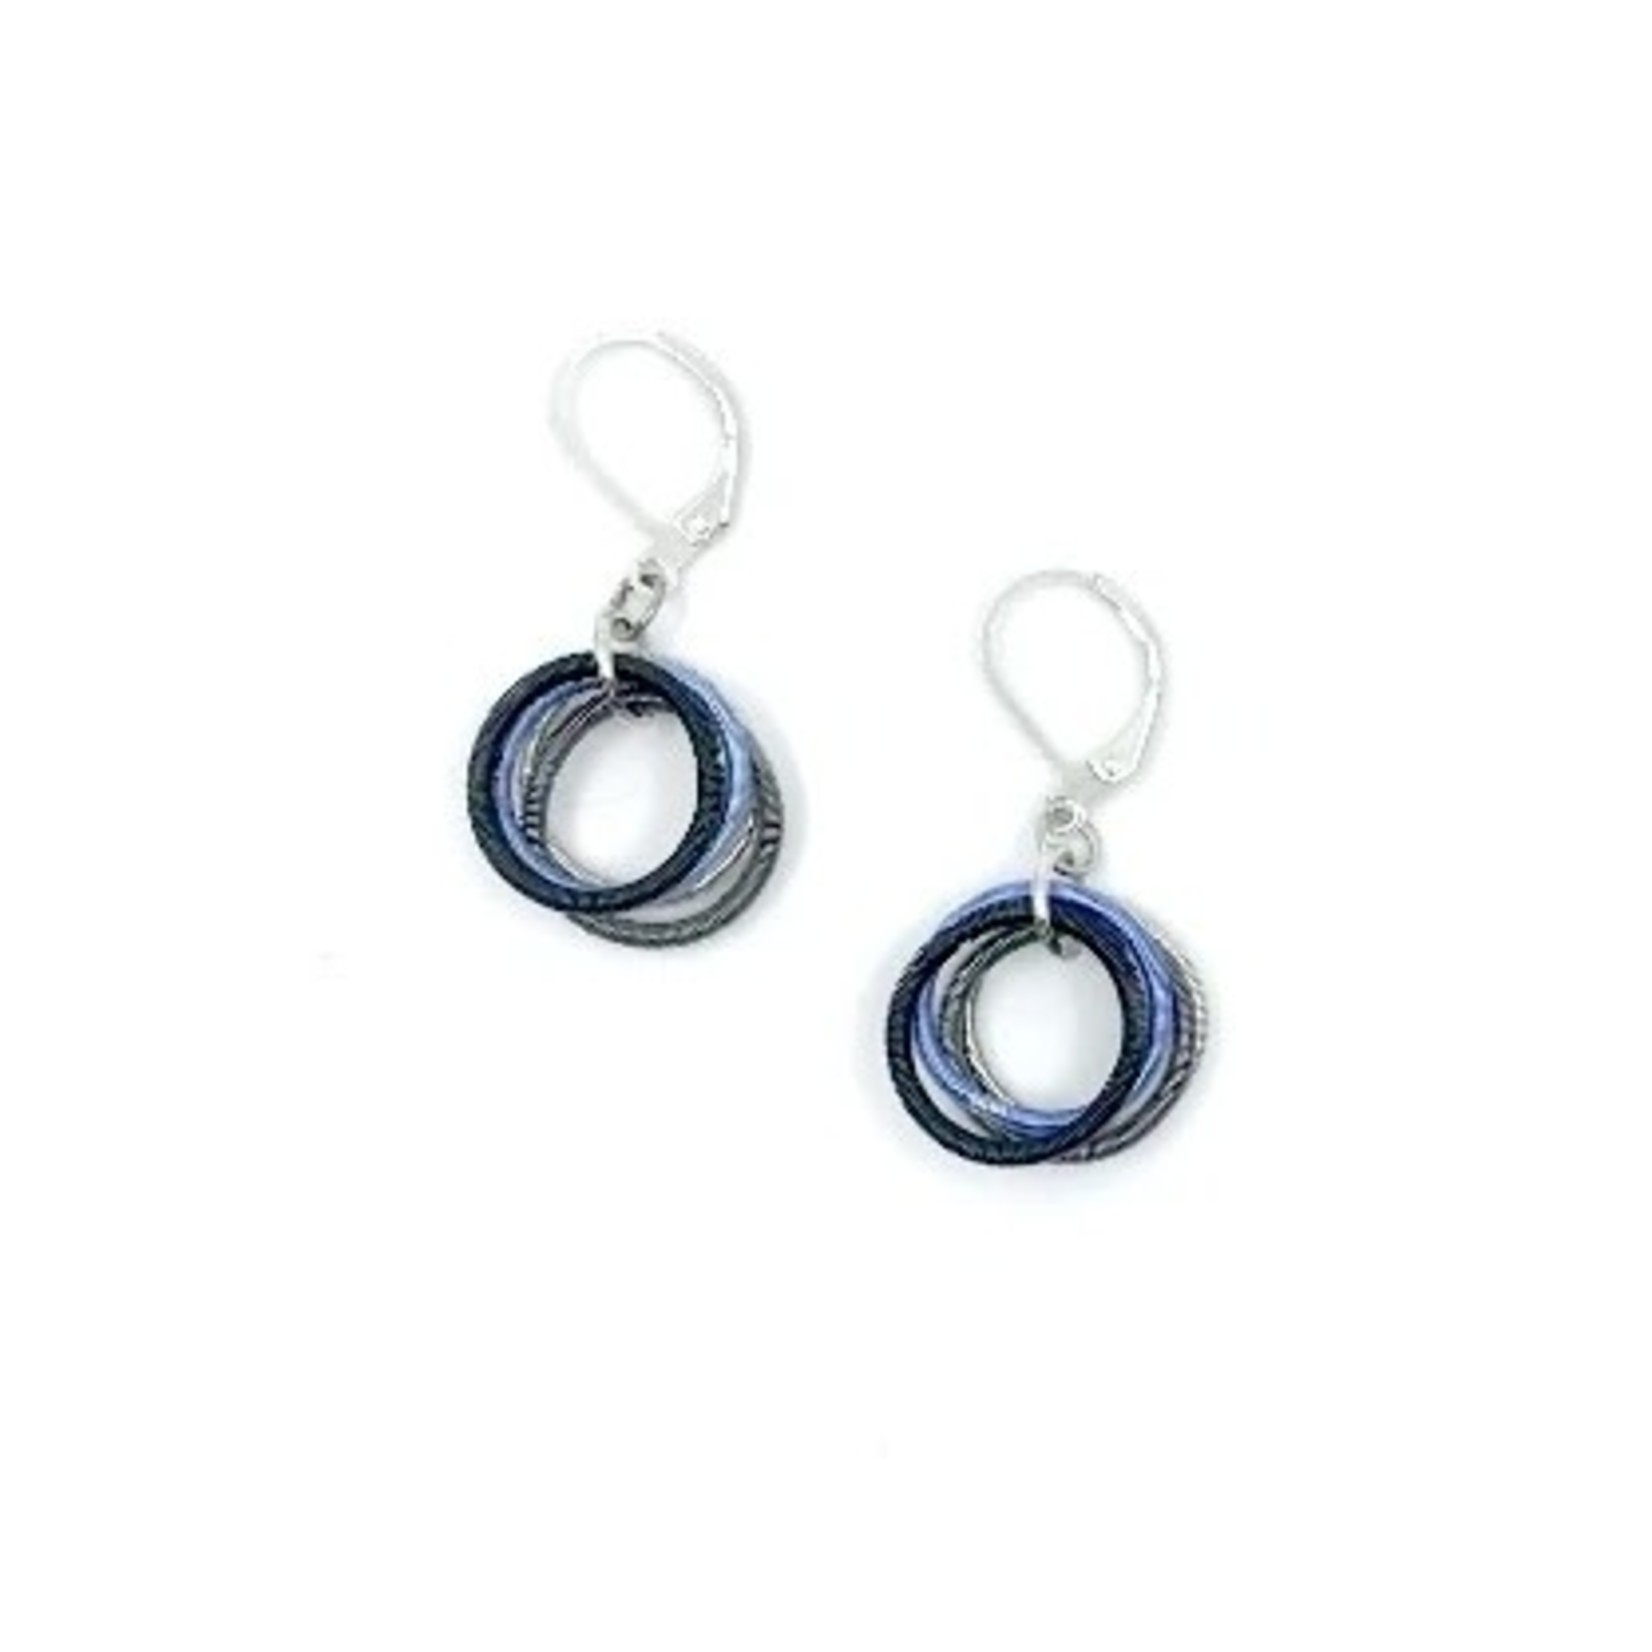 Sea Lily Blue/Black/Silver Piano Wire Loop Earrings